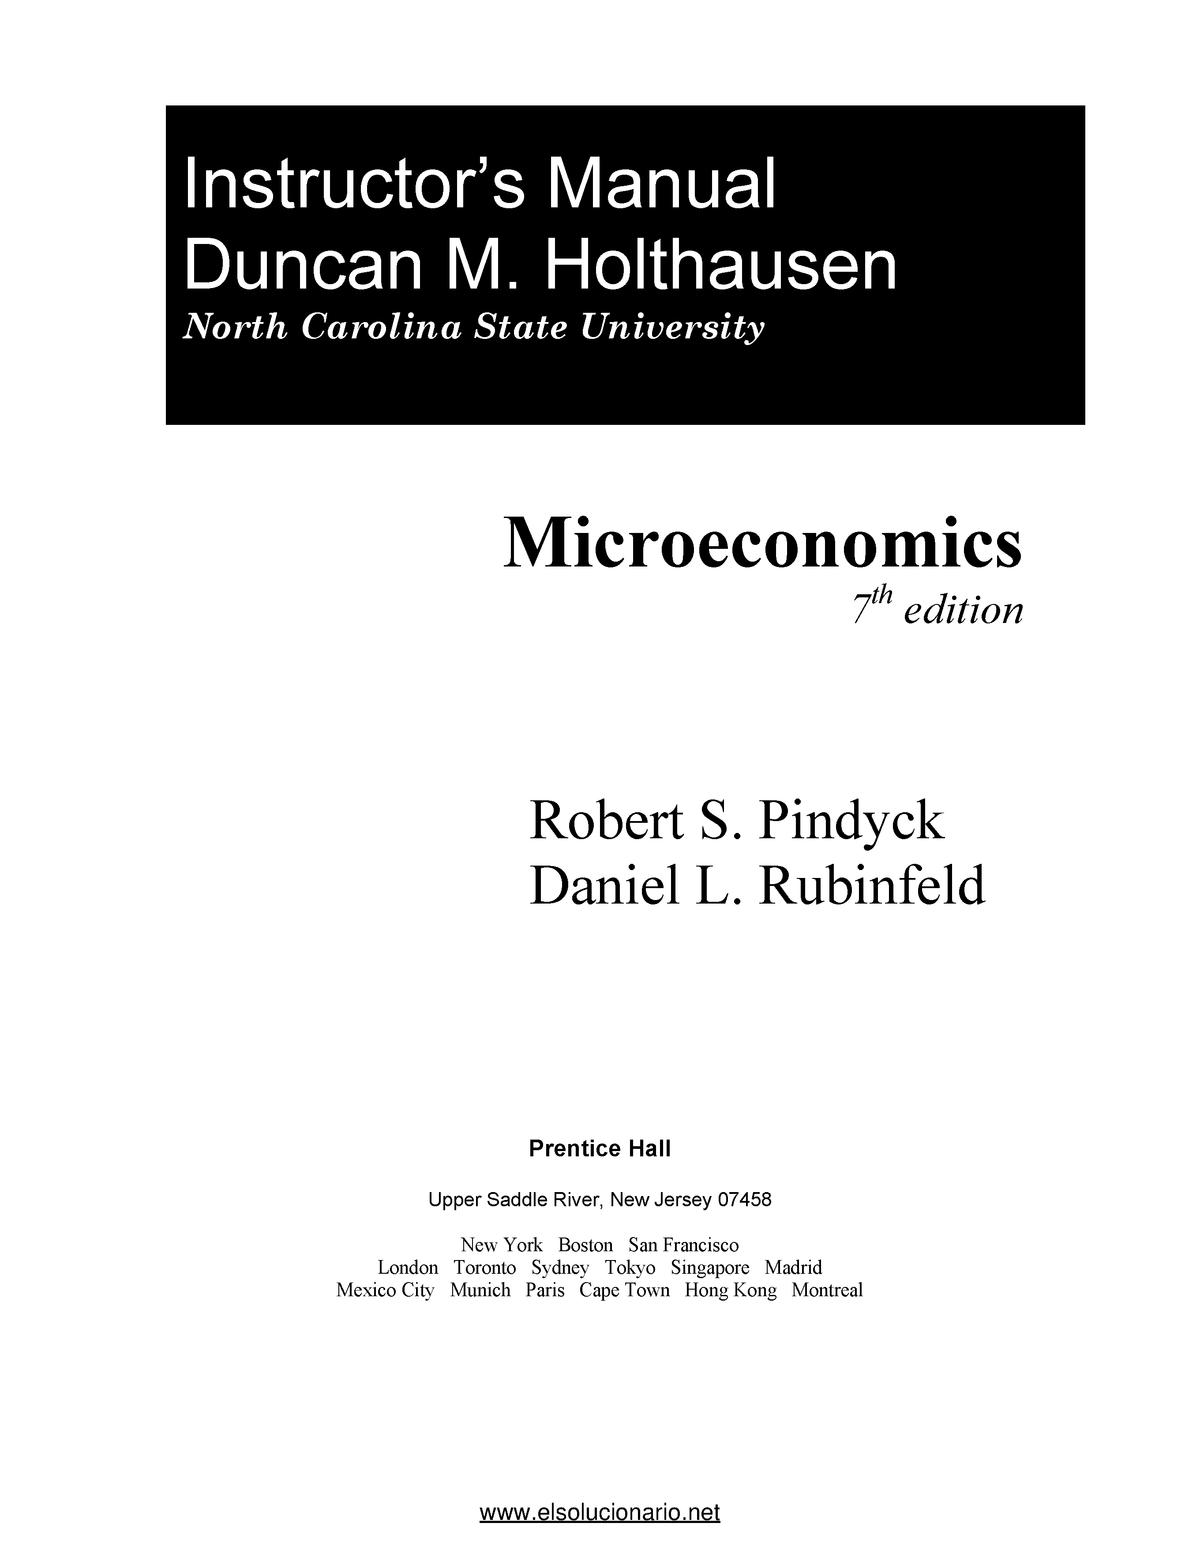 Edicion 7 epub pindyck microeconomia